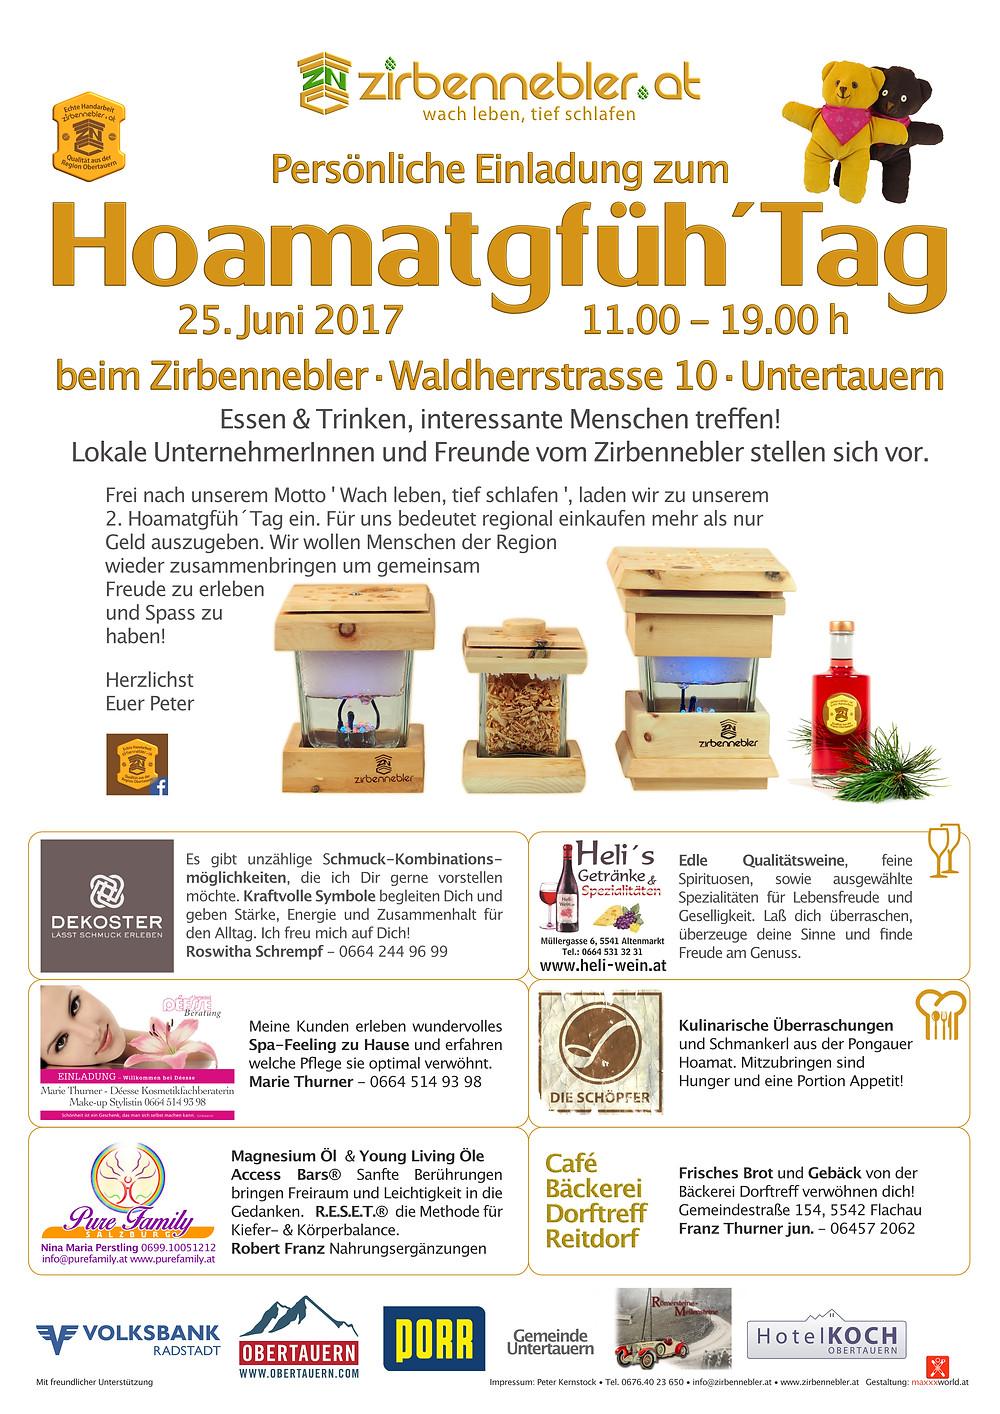 Hoamatgfüh Tag 2017 - Zirbennebler